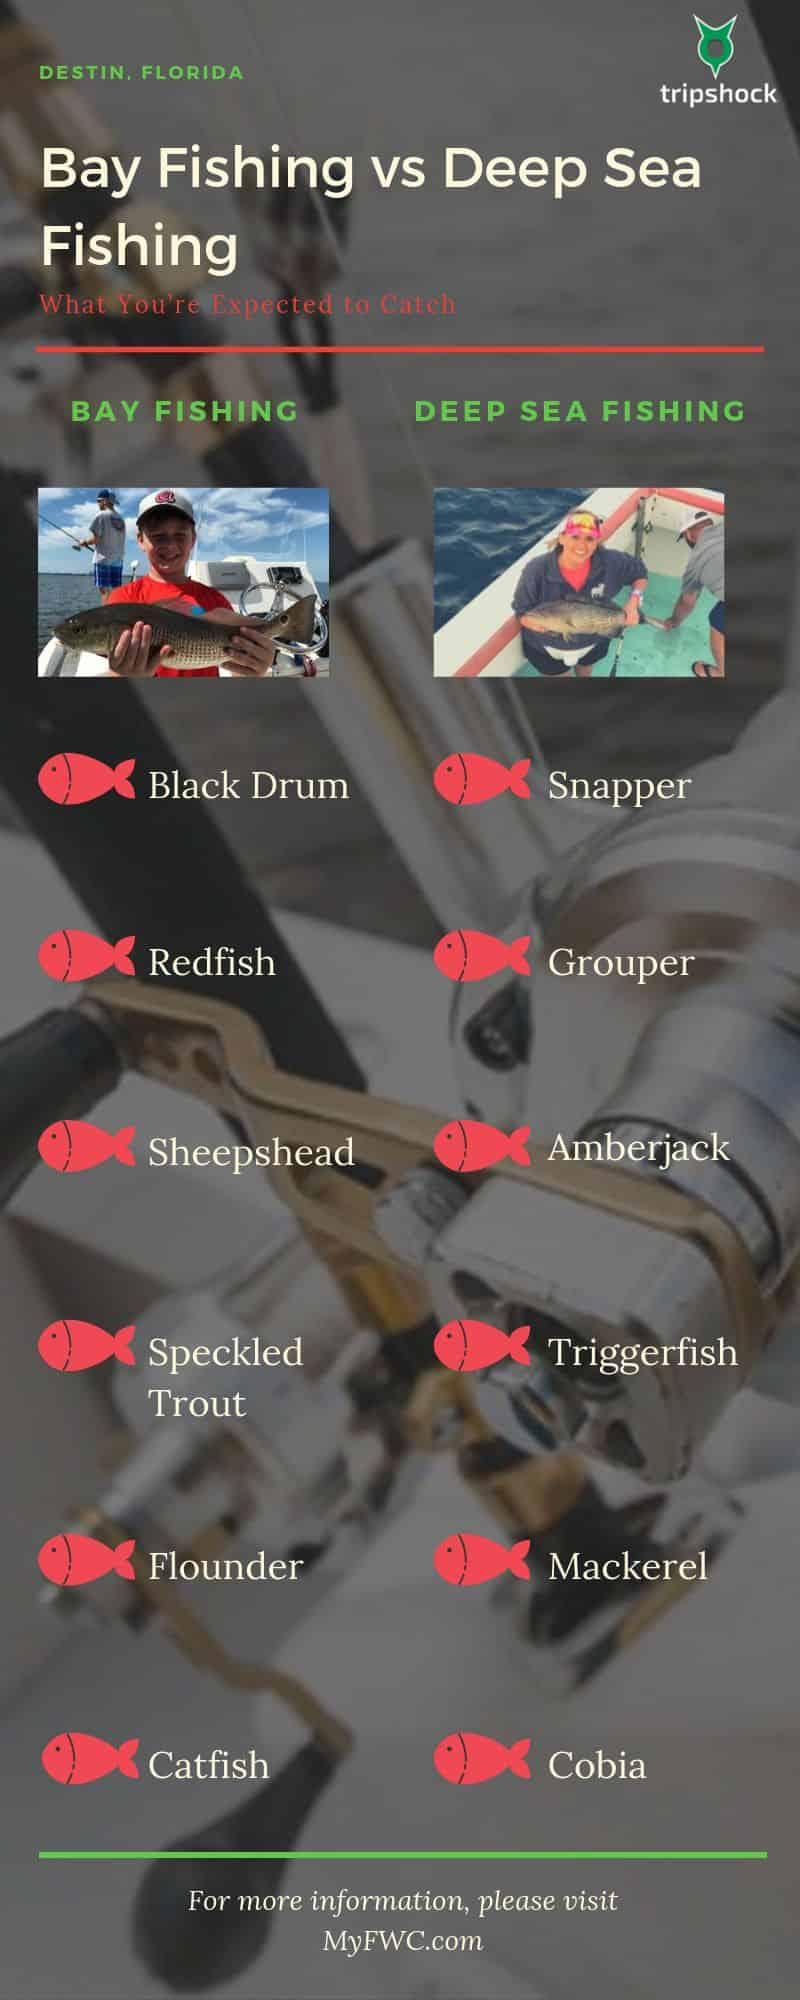 bay fishing vs deep sea fishing graphic